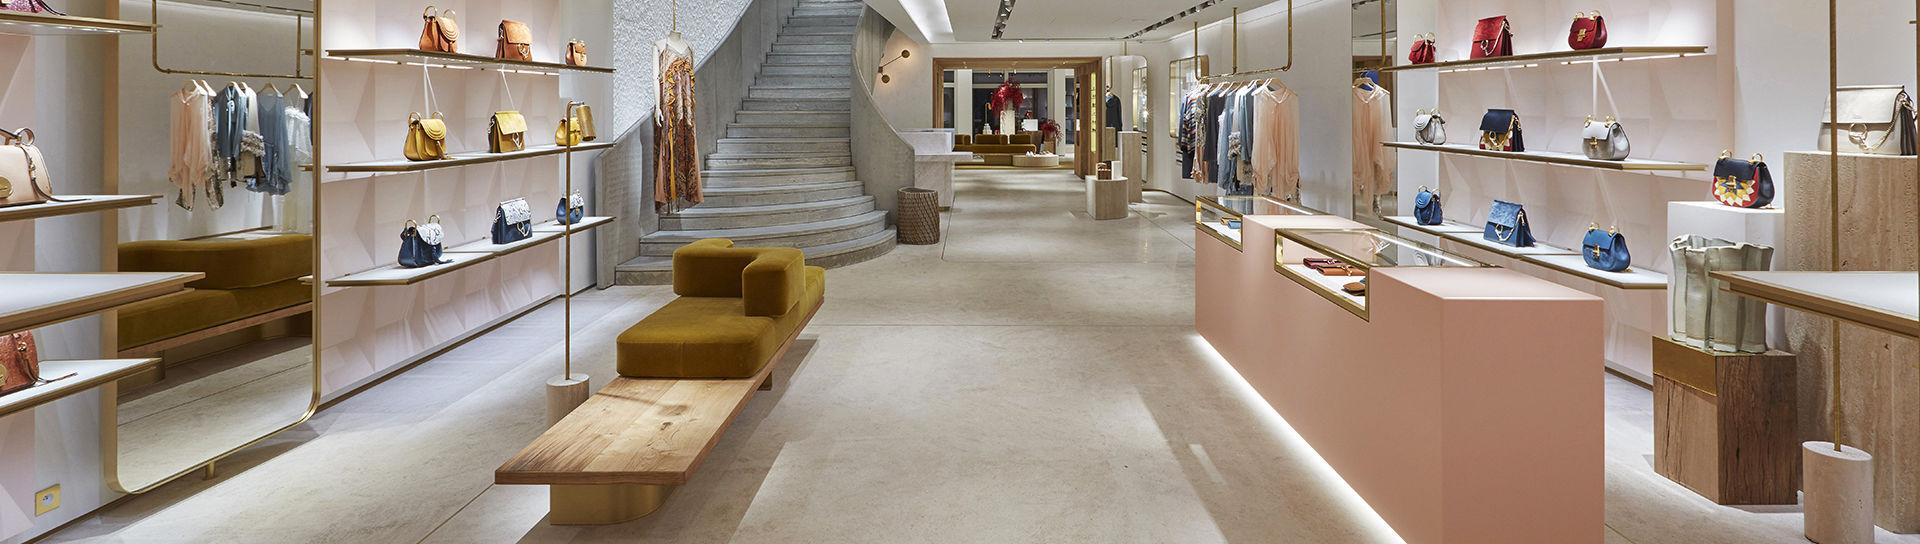 Www fashion bug com store locator 75